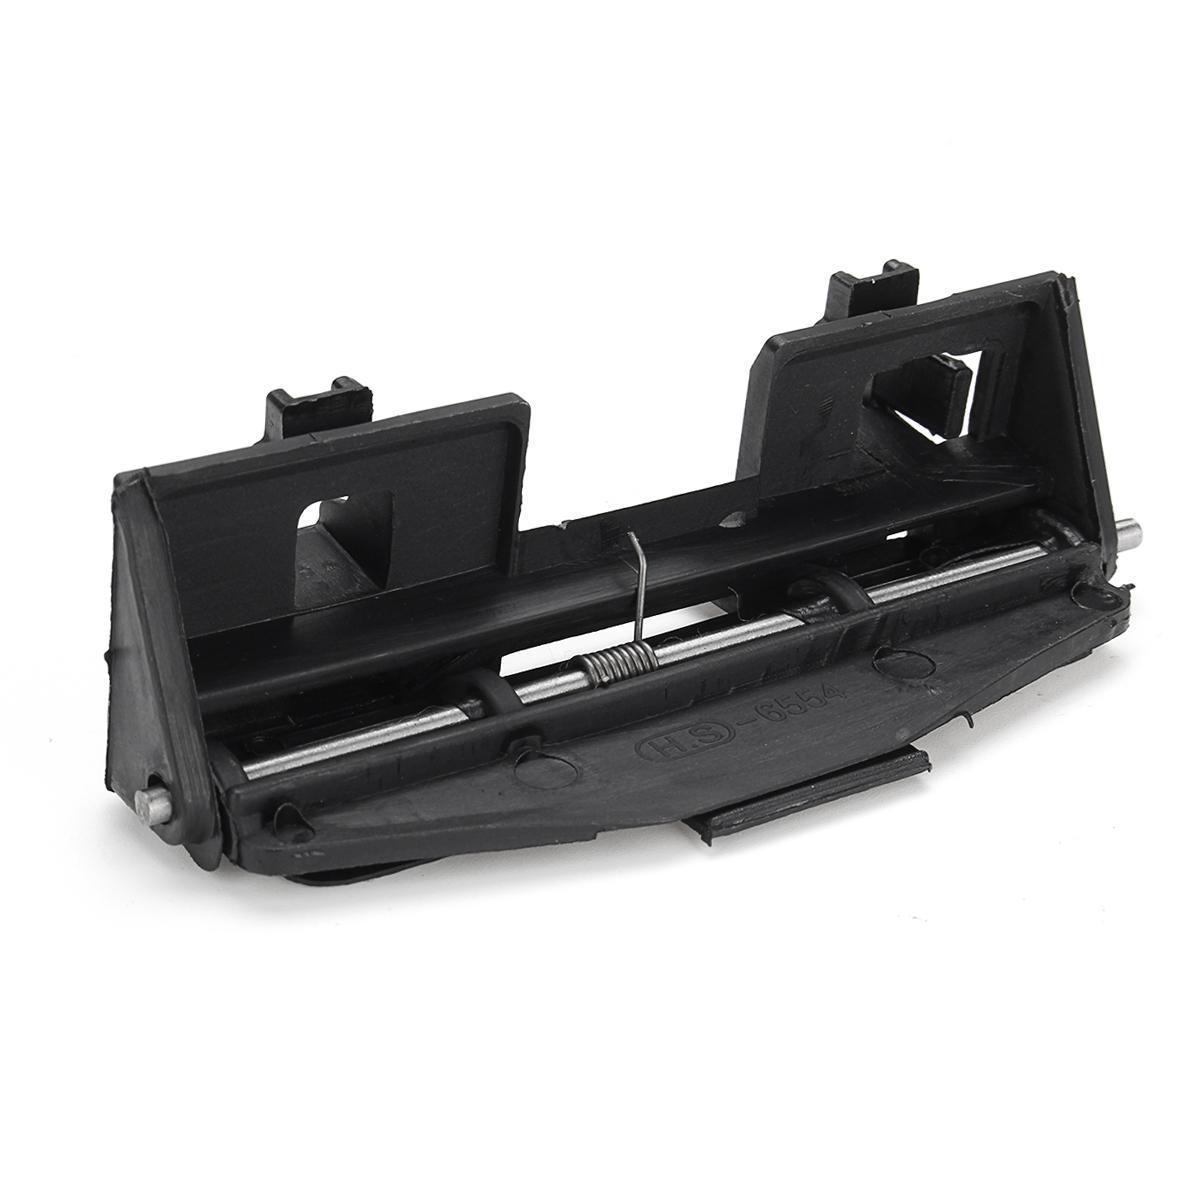 Brandstoftank Gas Deur Scharnier Filler Flap Scharnier Plastic & Aluminium voor BMW 5 7 Serie E32 E34 Saloon 51171928197